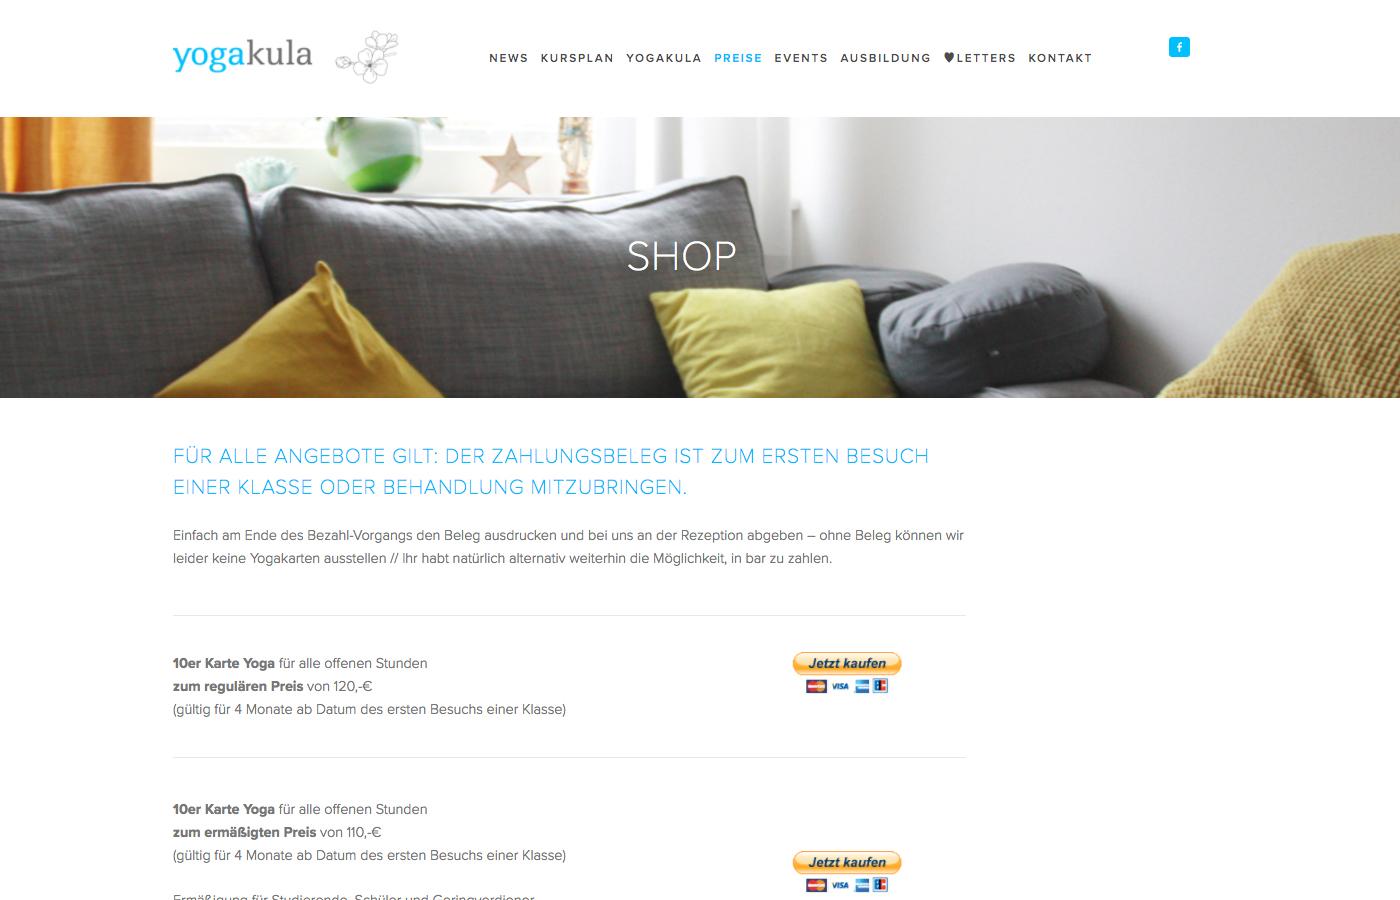 kula_website_1400x900_scr_0004_Ebene 4.jpg